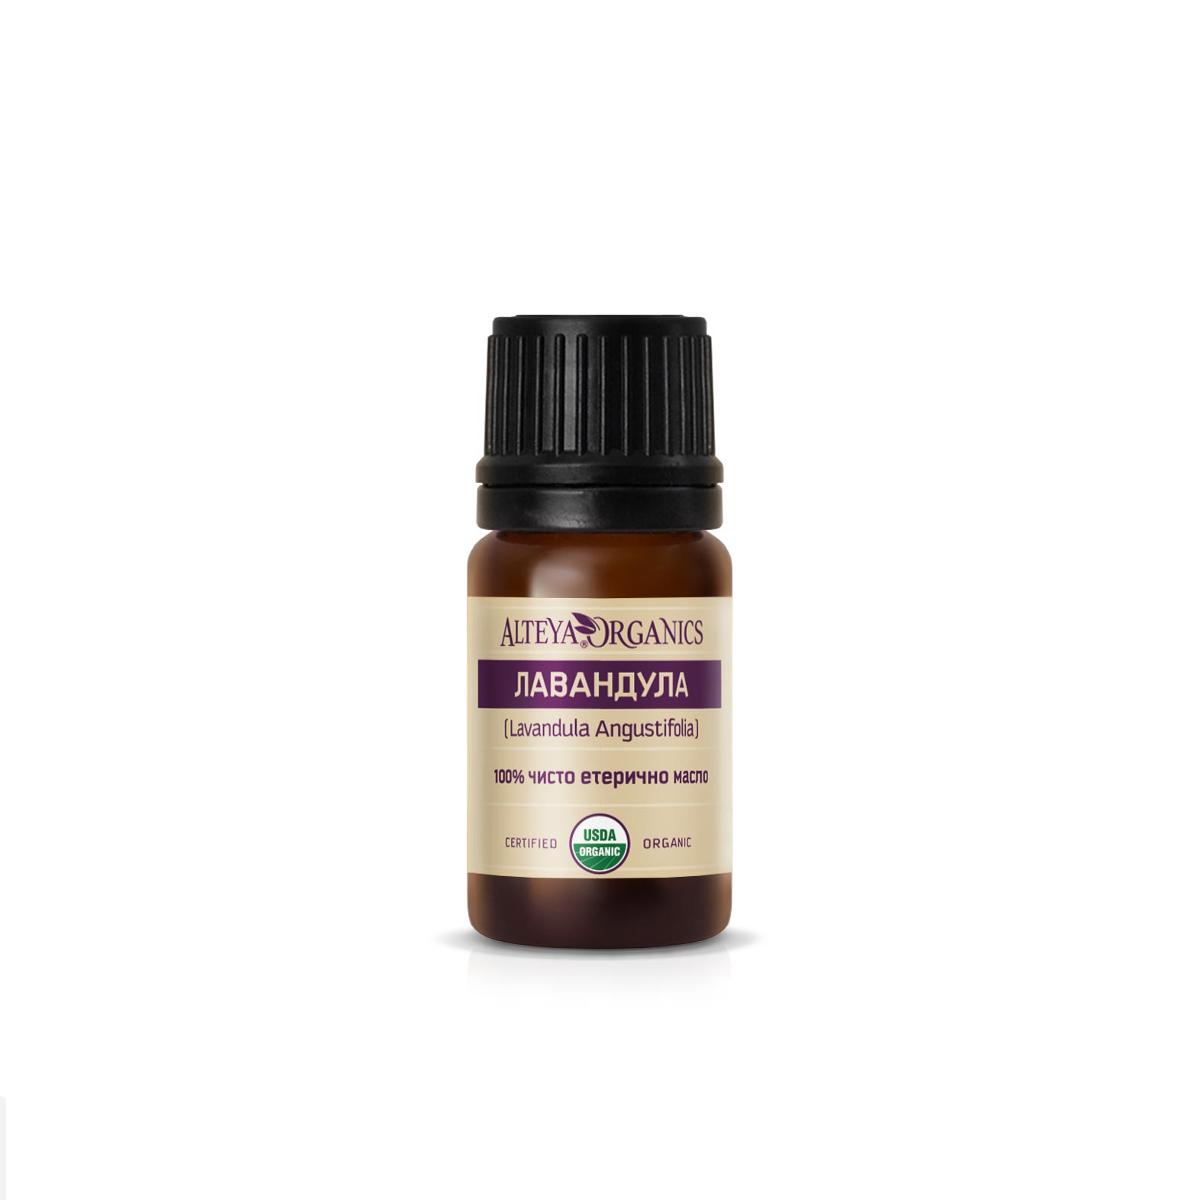 Bio organic lavender essential oil Alteya Organics